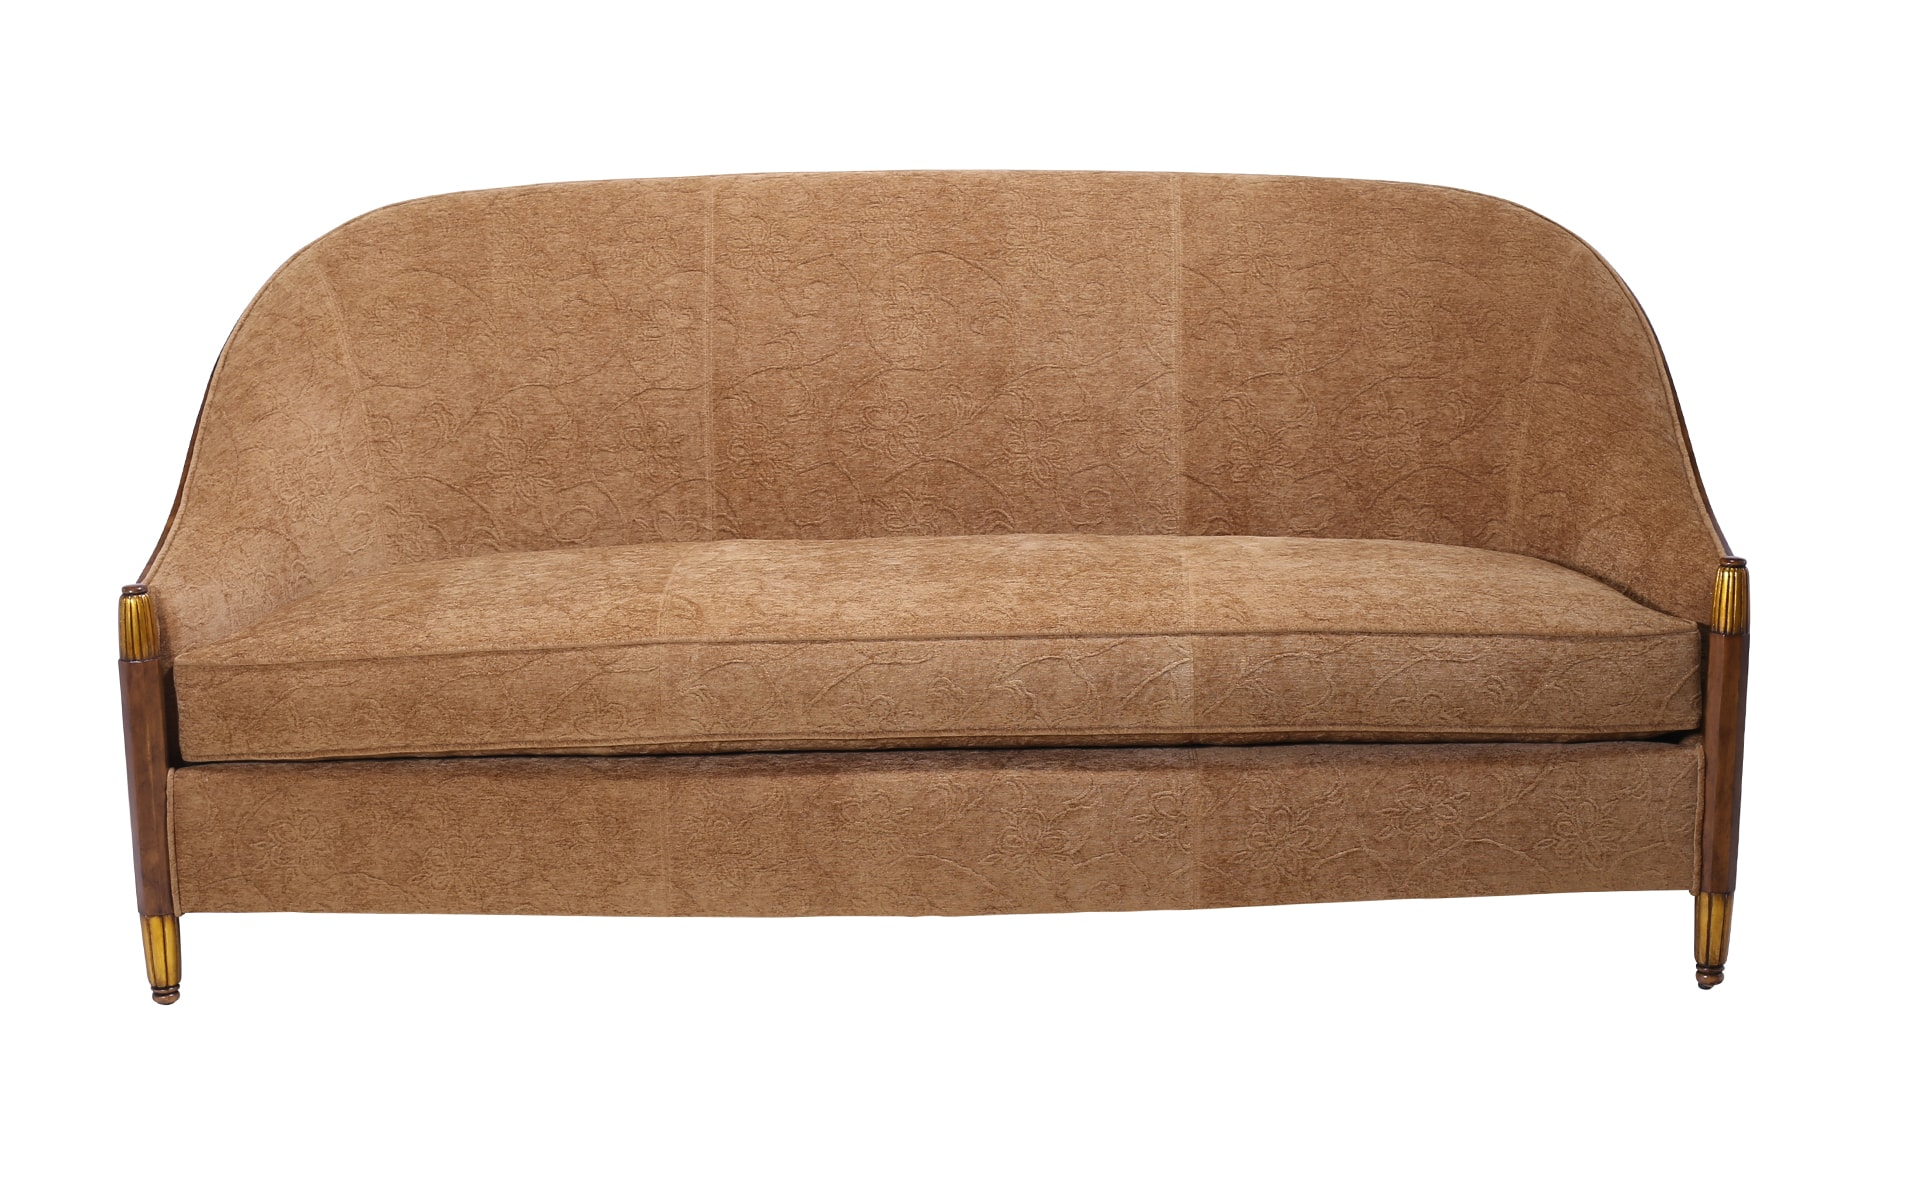 sofa art gallery t35 modern black sectional with 3 headrests deco armchair and tatiana tafur